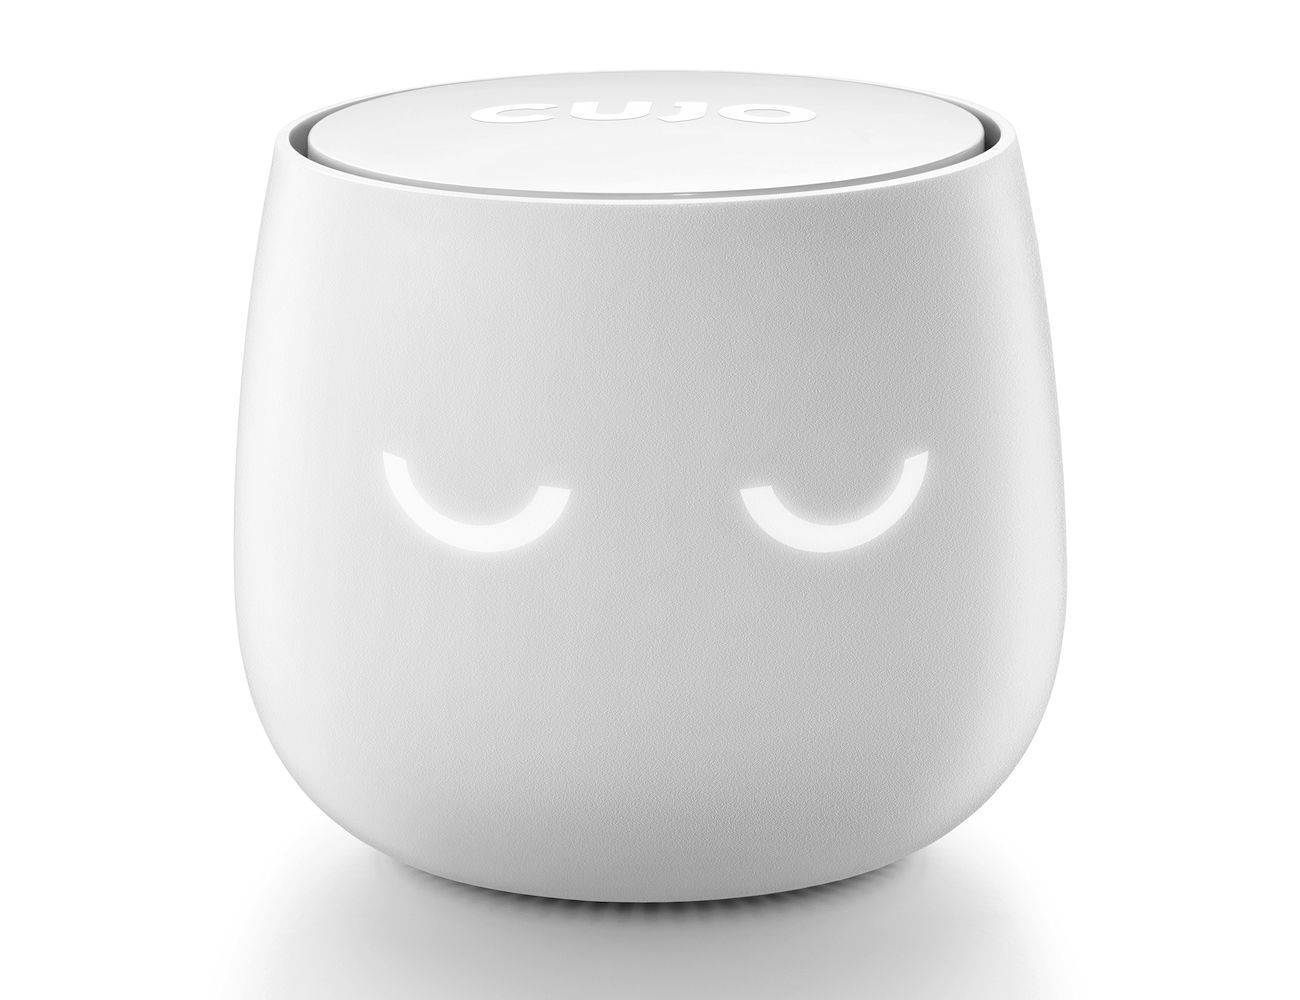 CUJO Smart Home Firewall Device